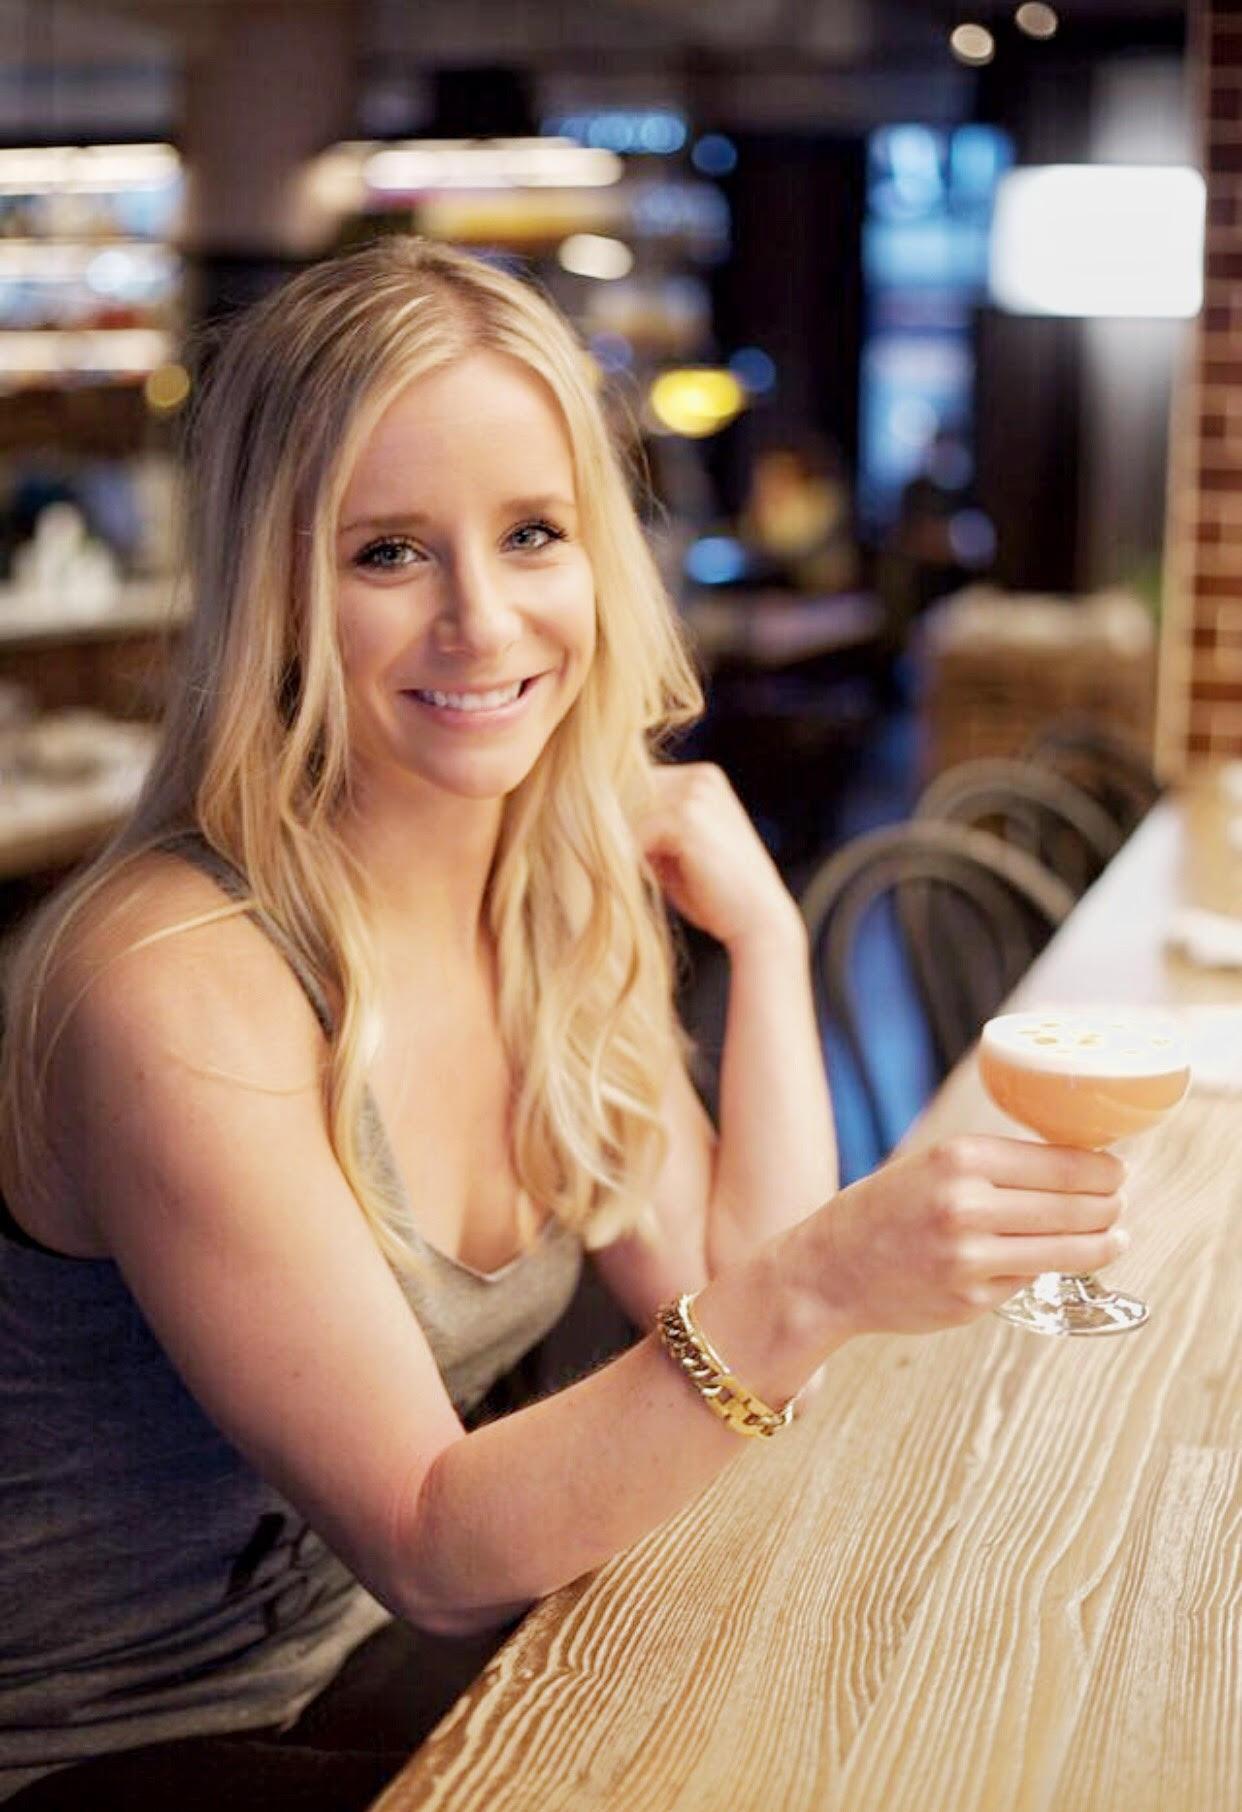 megan holding drink at bar